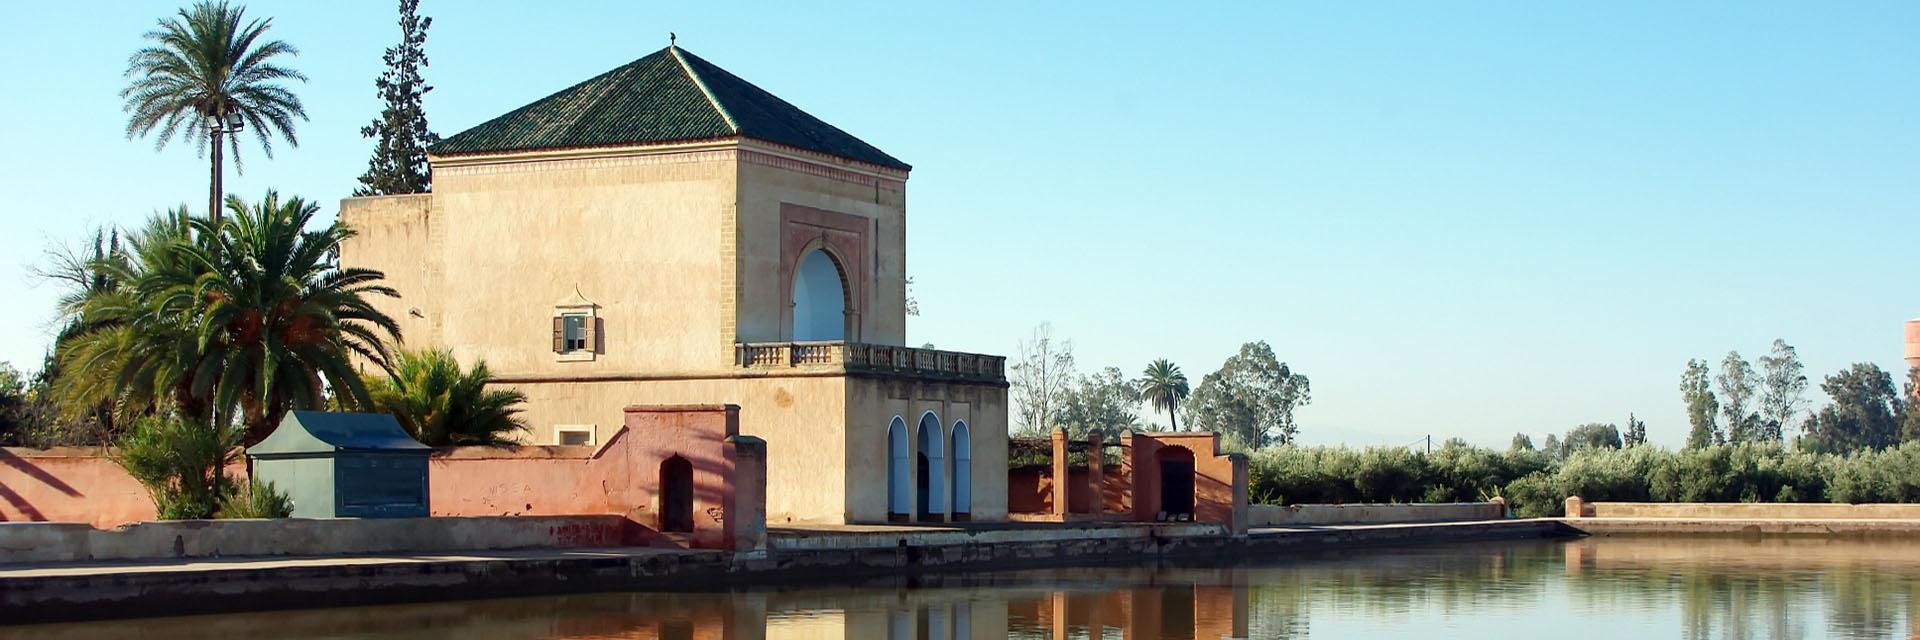 morocco-medinas